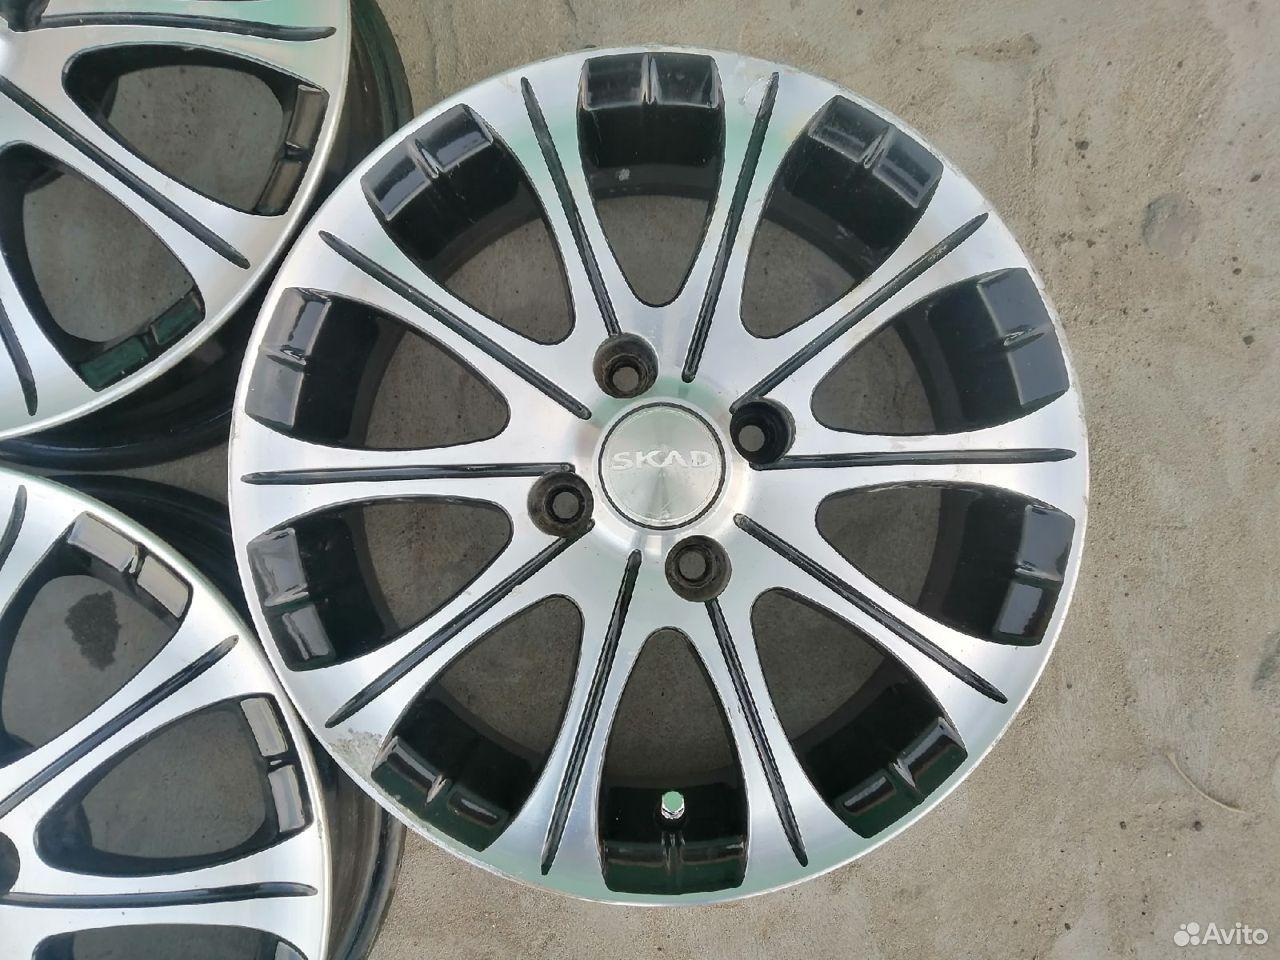 Литые диски Skad R14 4x98 на Ваз/Датсун